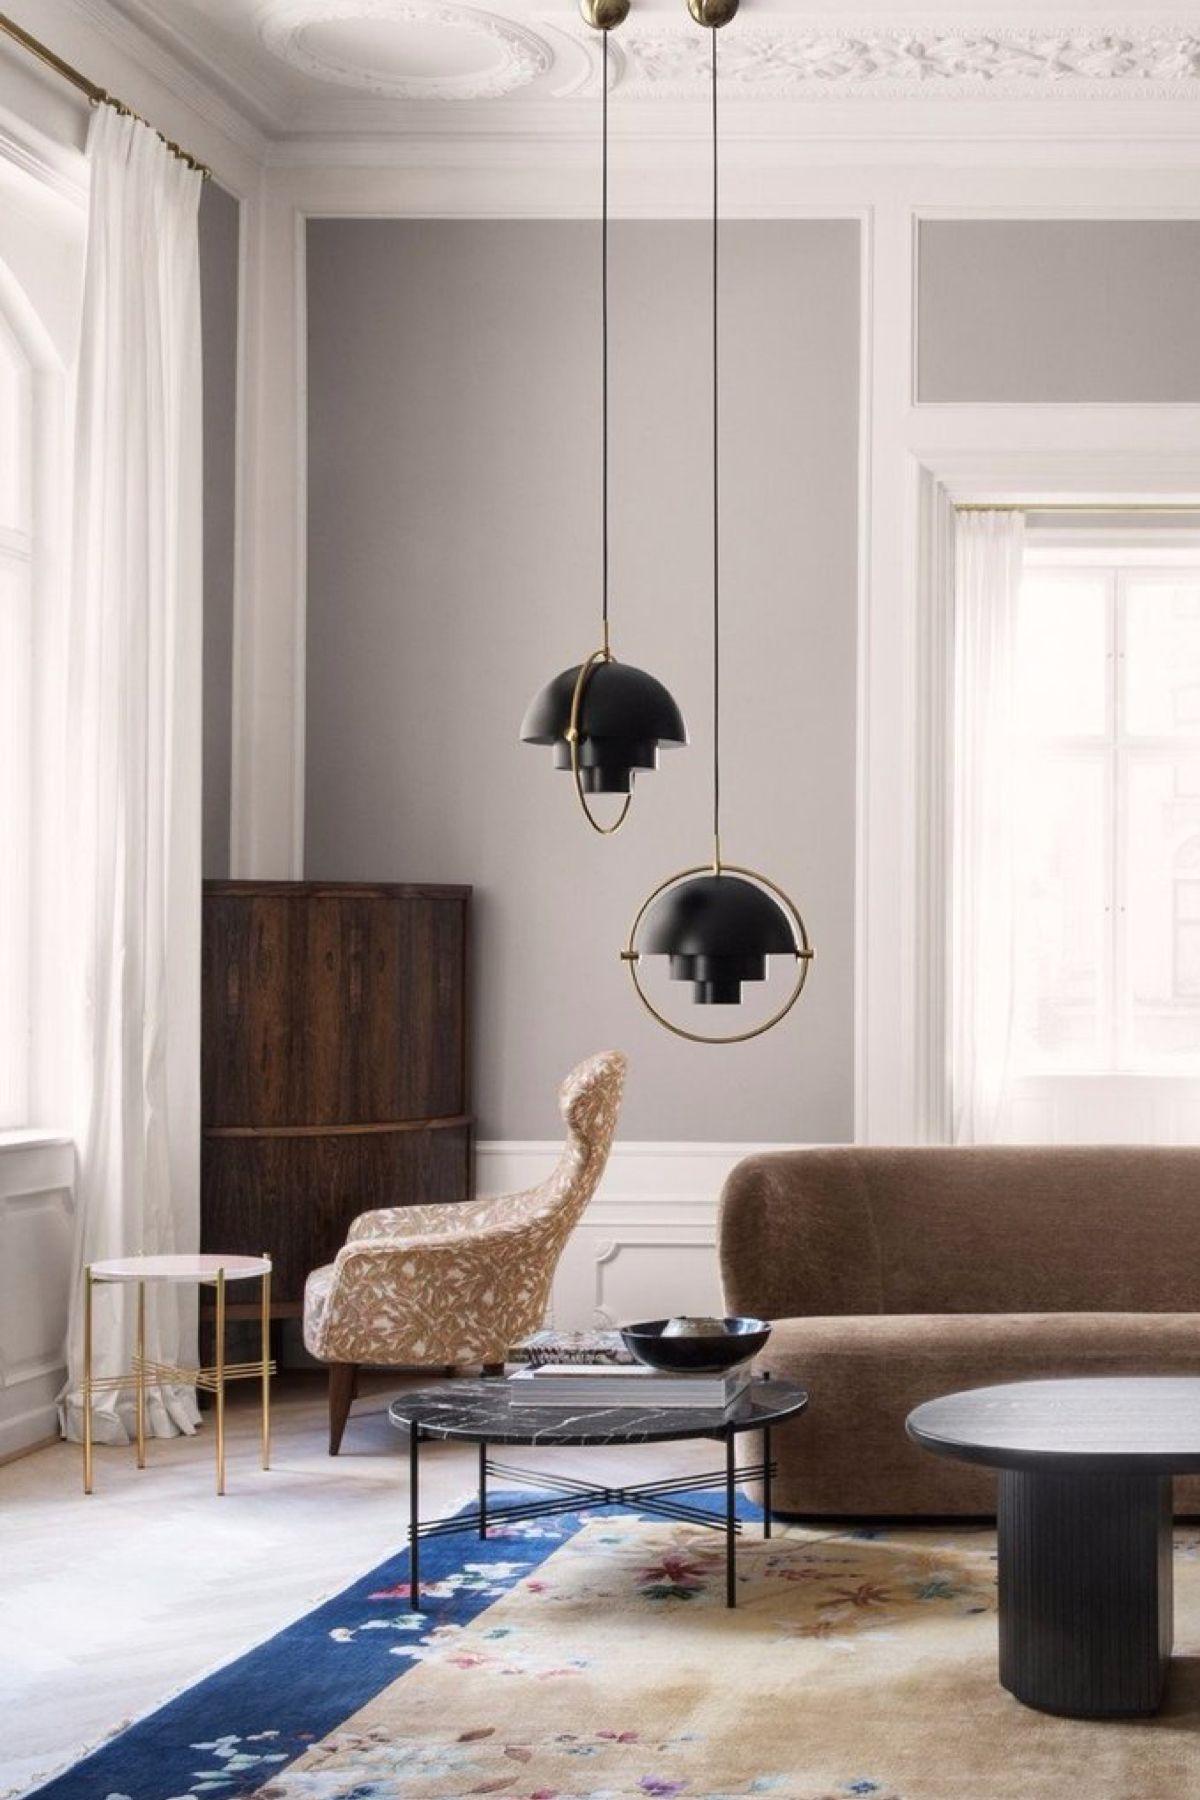 Light Lite Pendant Multi Gubi BlackbrassSource In Furniture 8P0wknXO